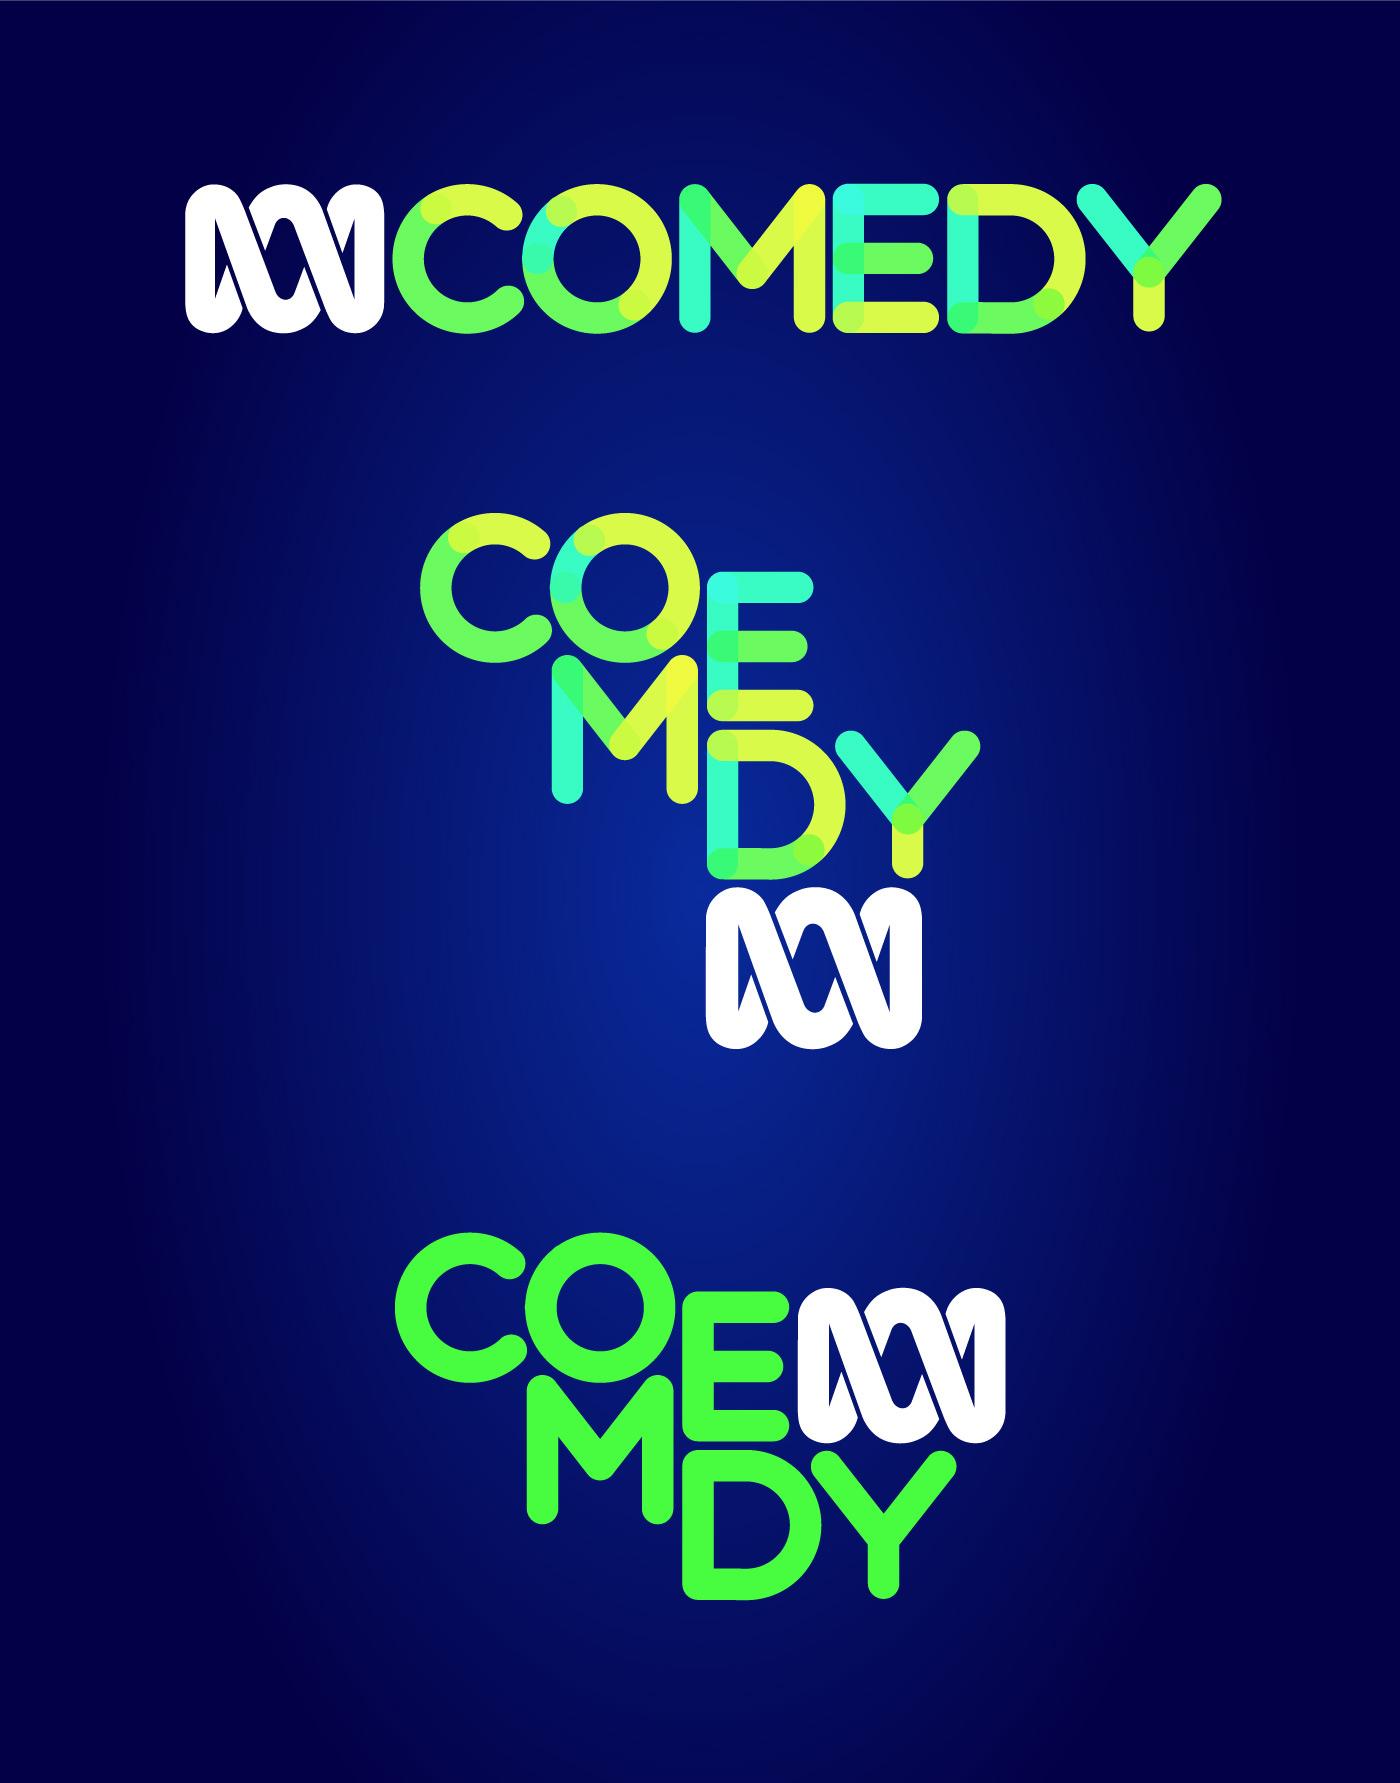 New ABC Comedy logo variants (reversed)